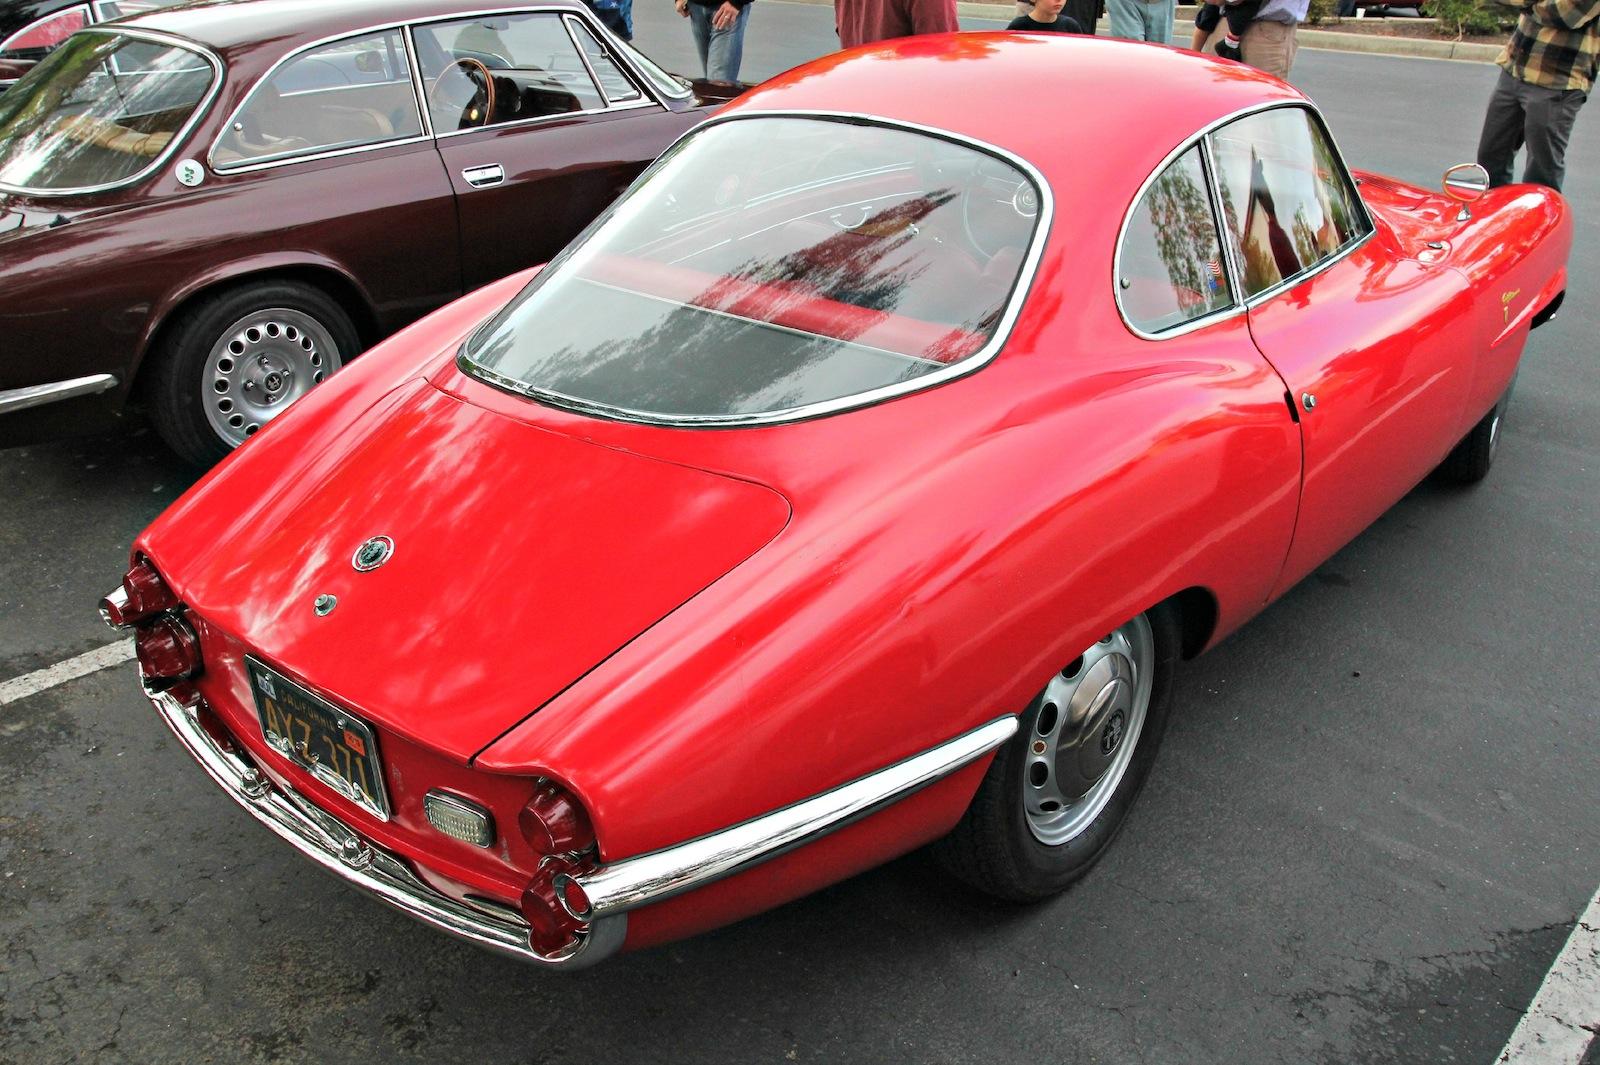 A Rare And Valuable Alfa Romeo Sprint Speciale